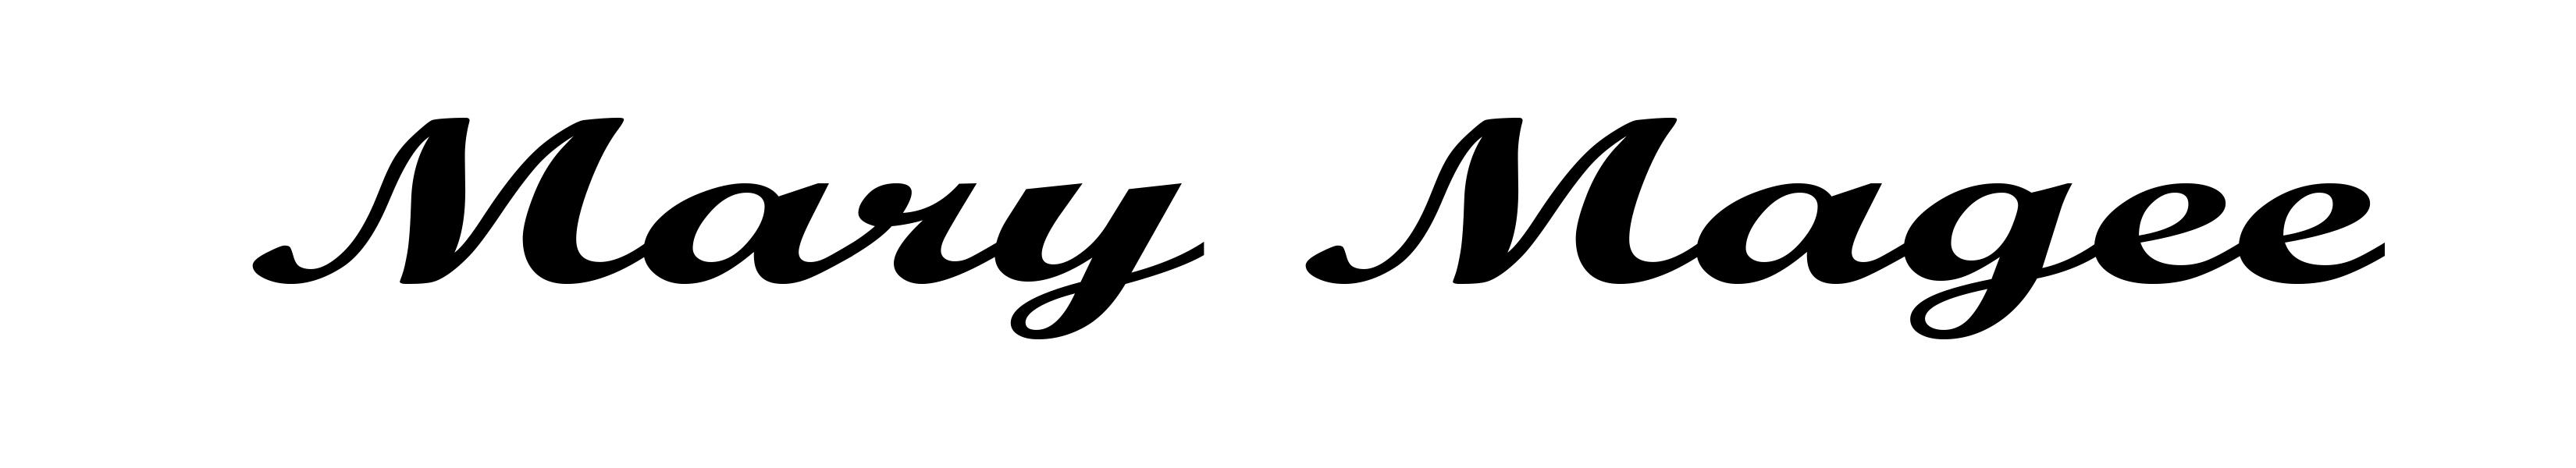 Mary Magee Signature